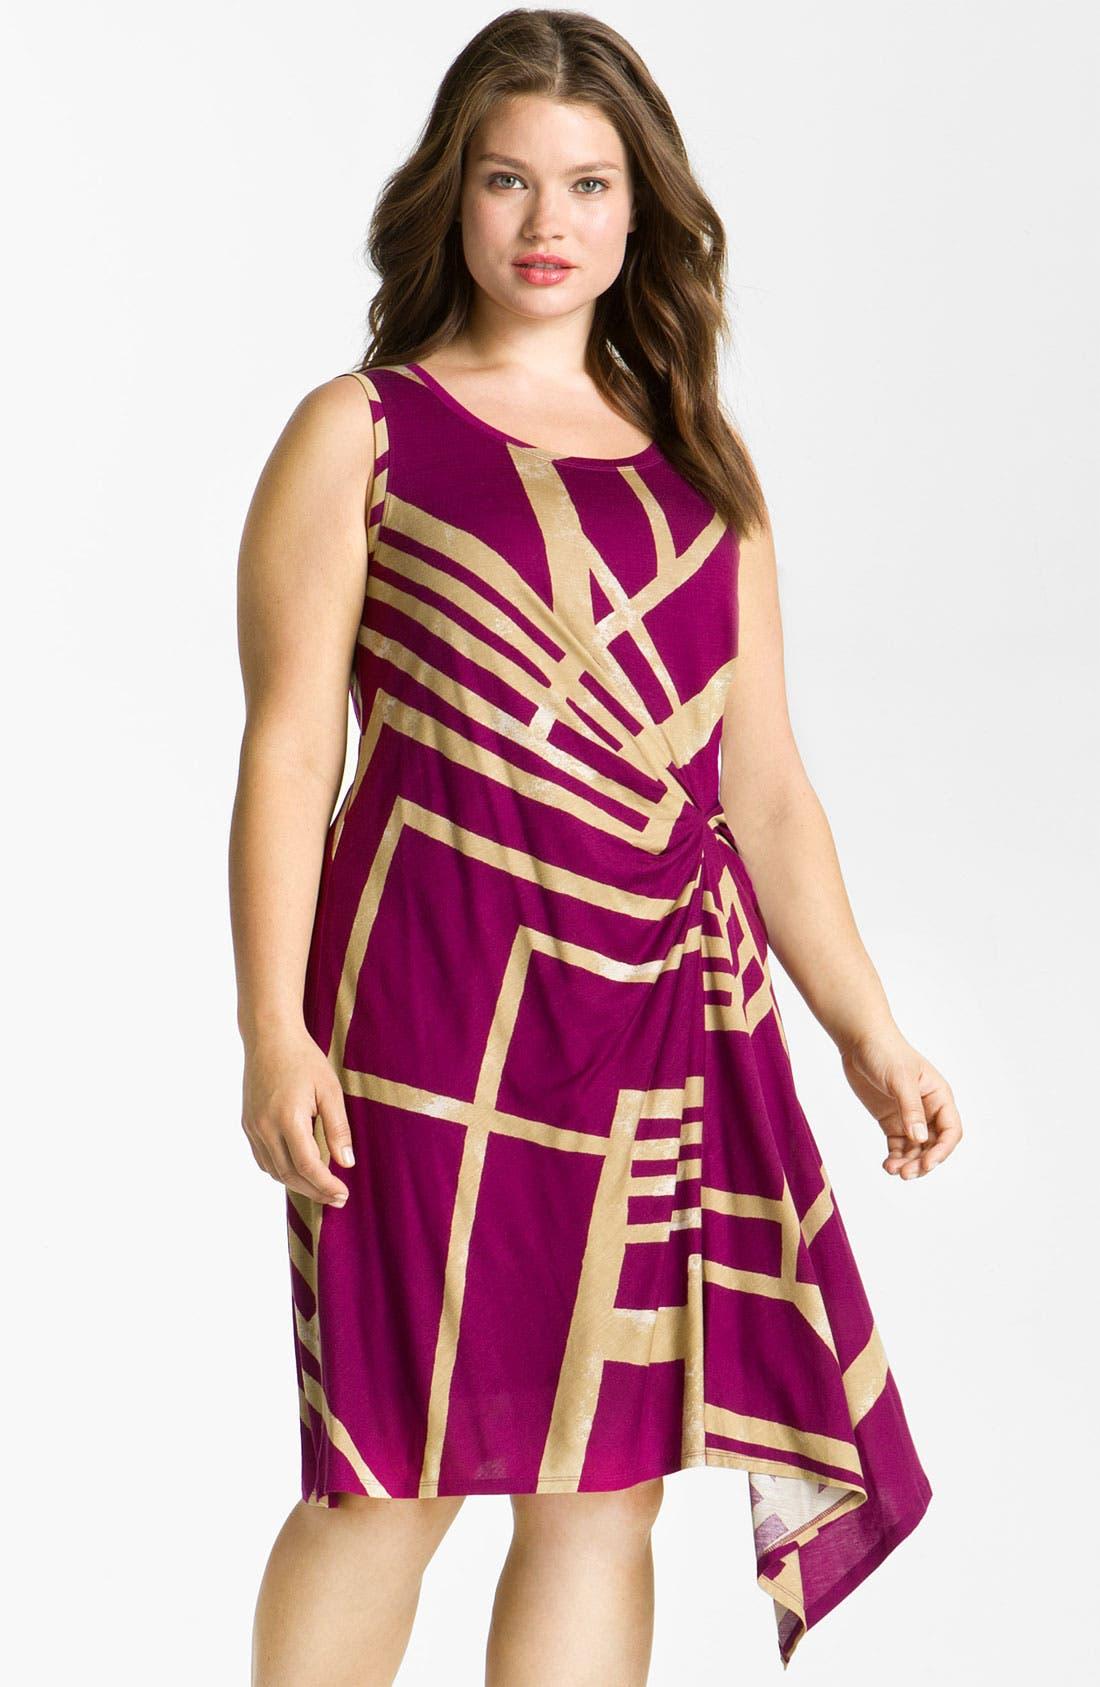 Alternate Image 1 Selected - DKNYC Draped Sleeveless Dress (Plus)